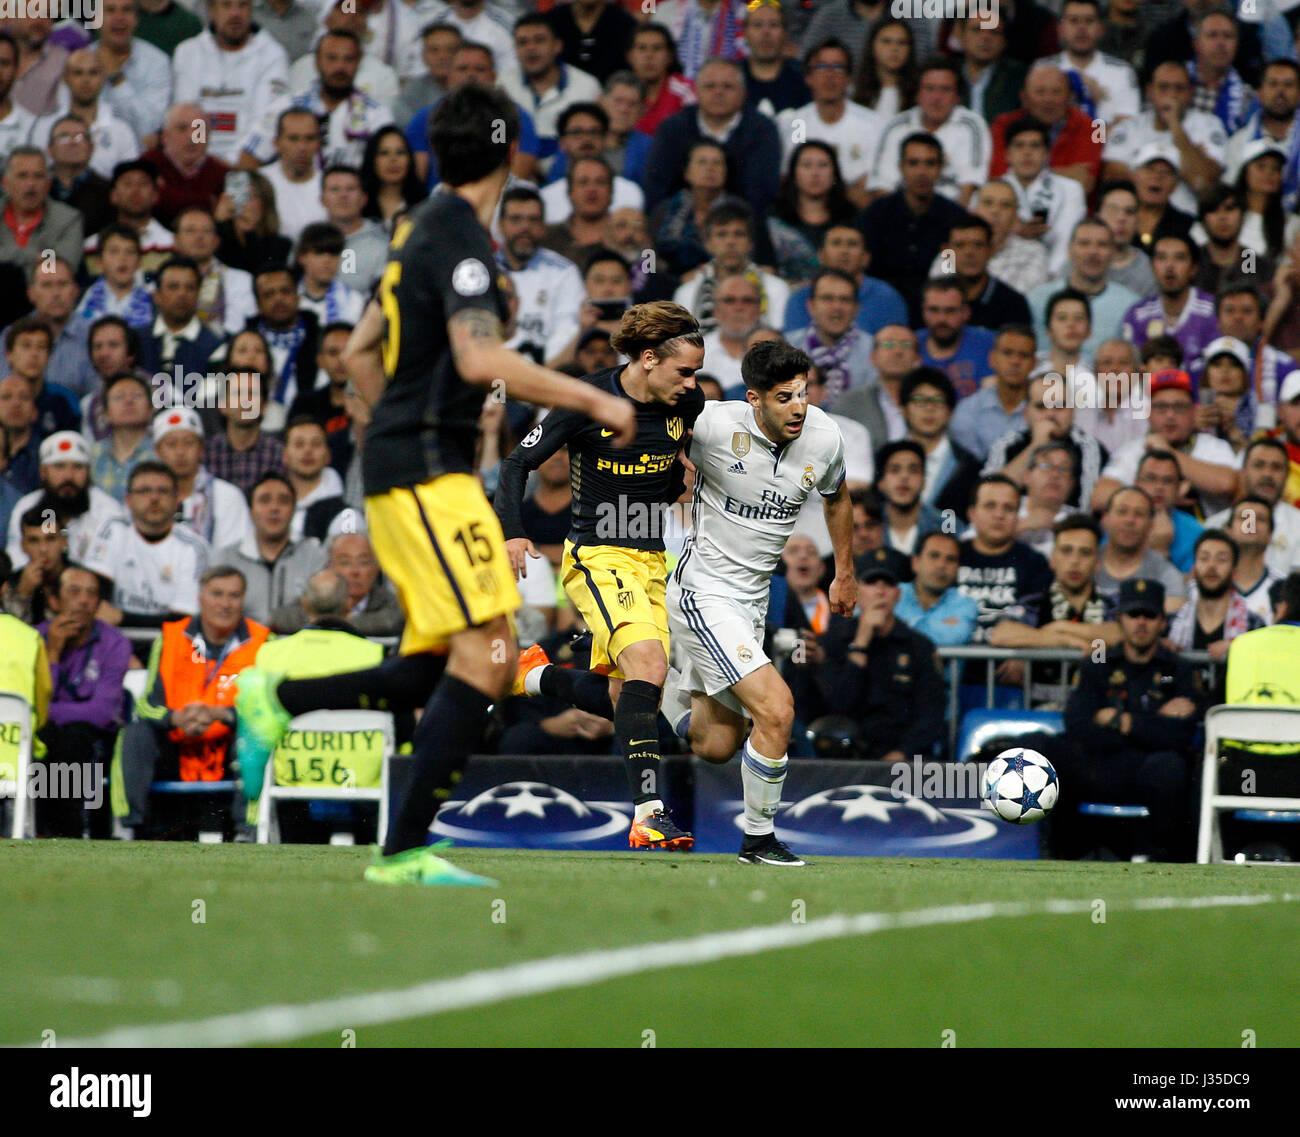 "Madrid, Spain. 02nd May, 2017. MADRID, ESPA""A - 02 Mayo de 2017: 20 ..."